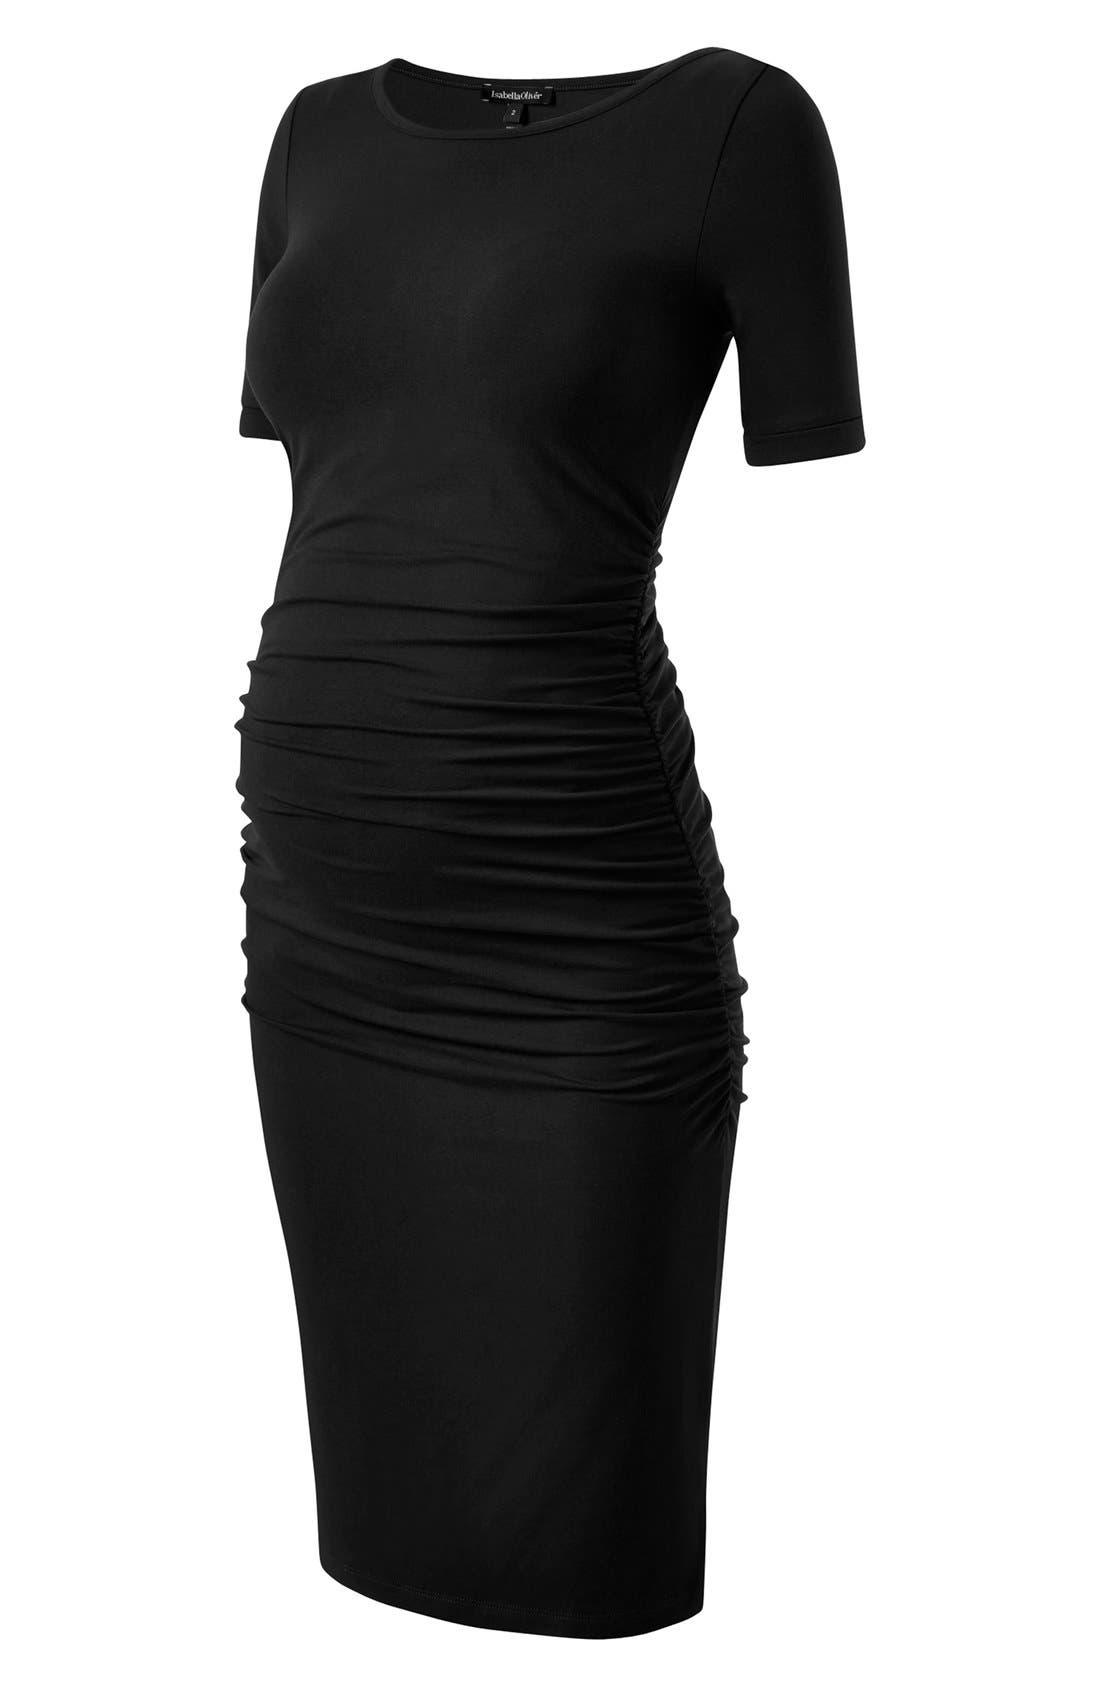 ISABELLA OLIVER,                             Ruched Maternity Dress,                             Alternate thumbnail 4, color,                             001